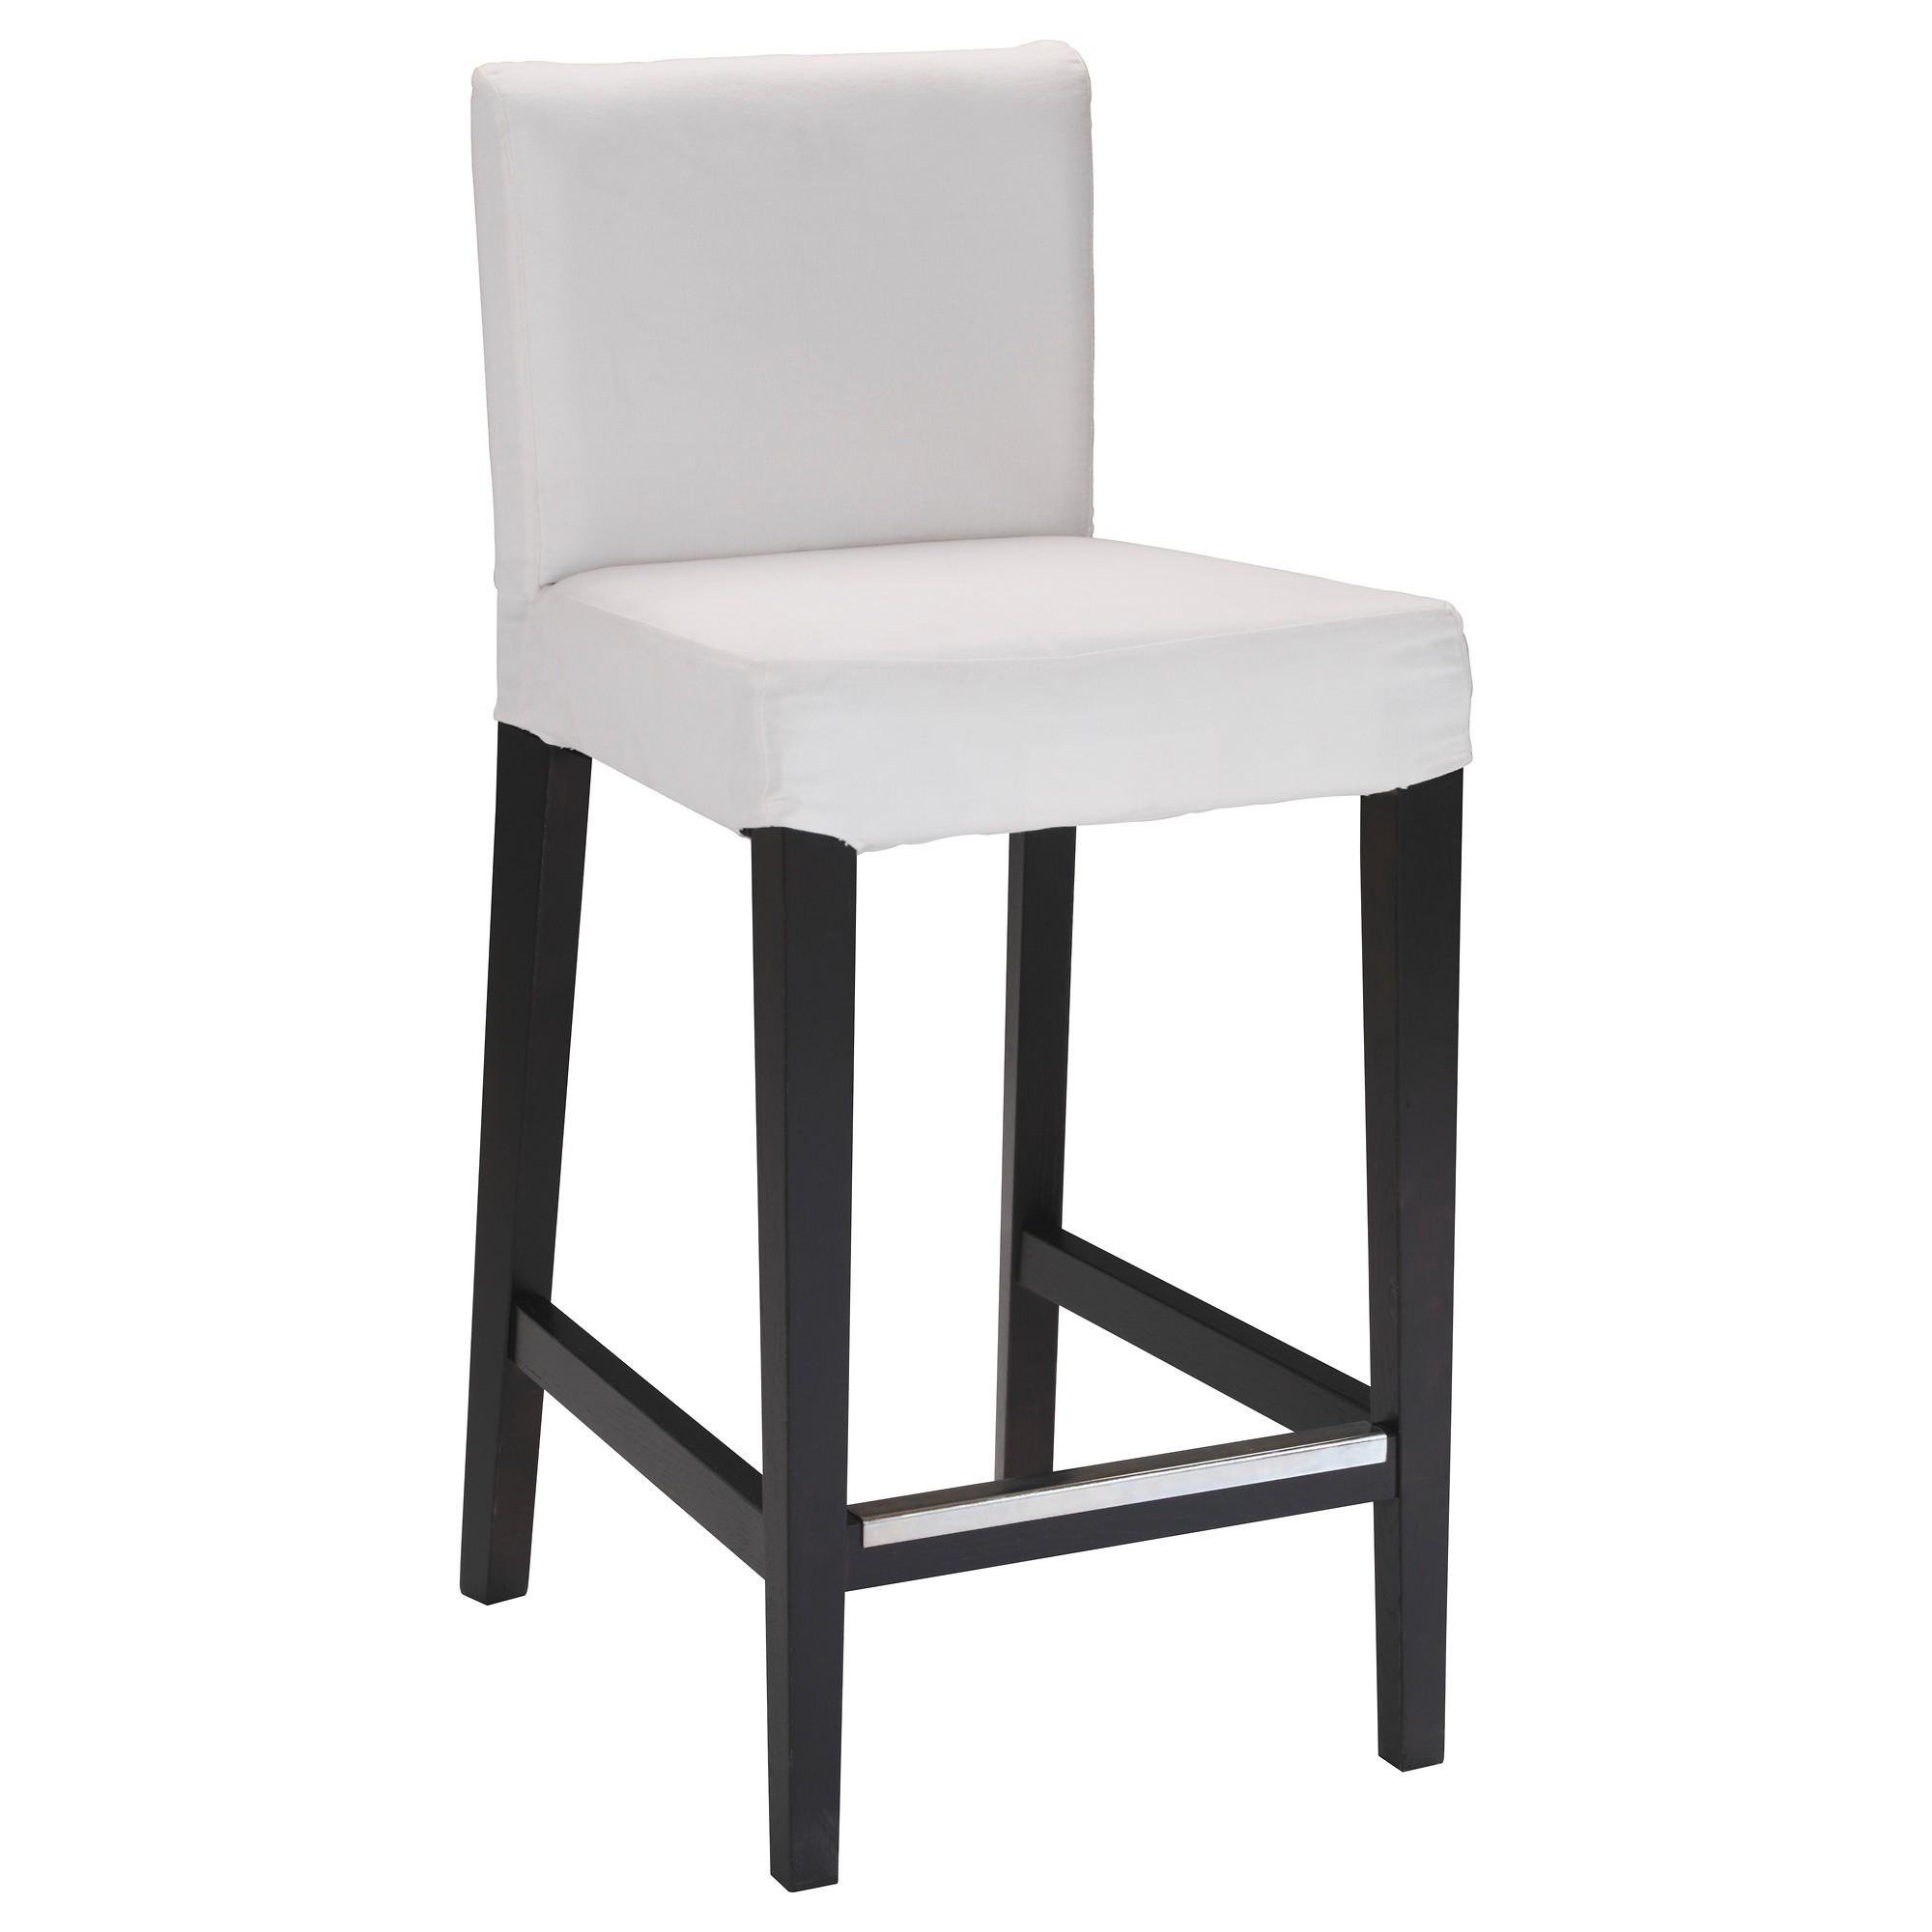 Ikea Chaise Haute Cuisine